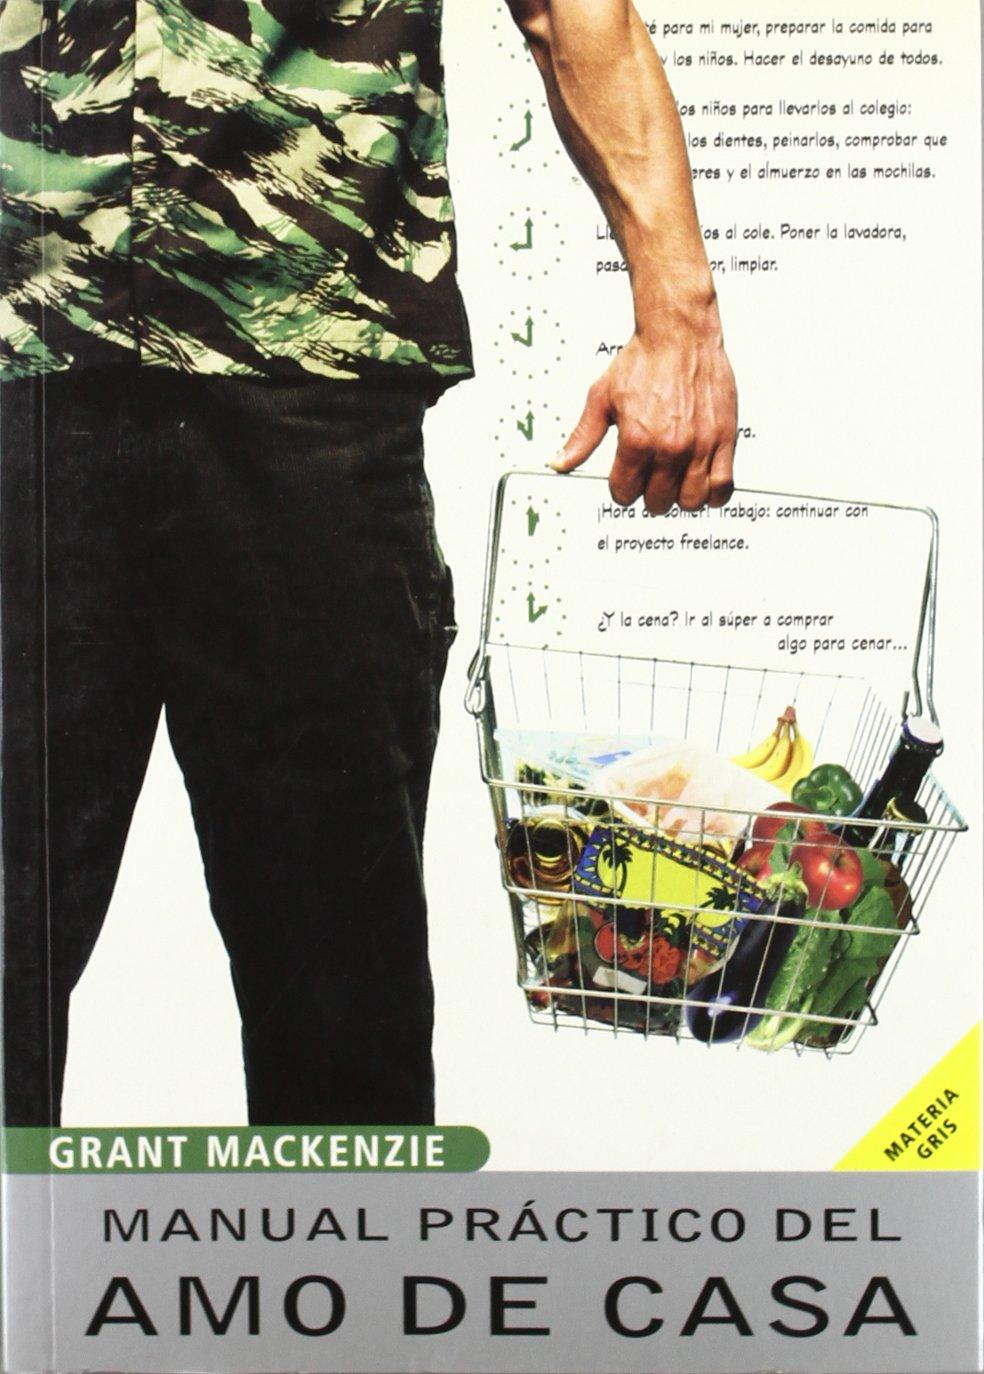 Manual práctico del amo de casa: GRANT MACKENZIE ...